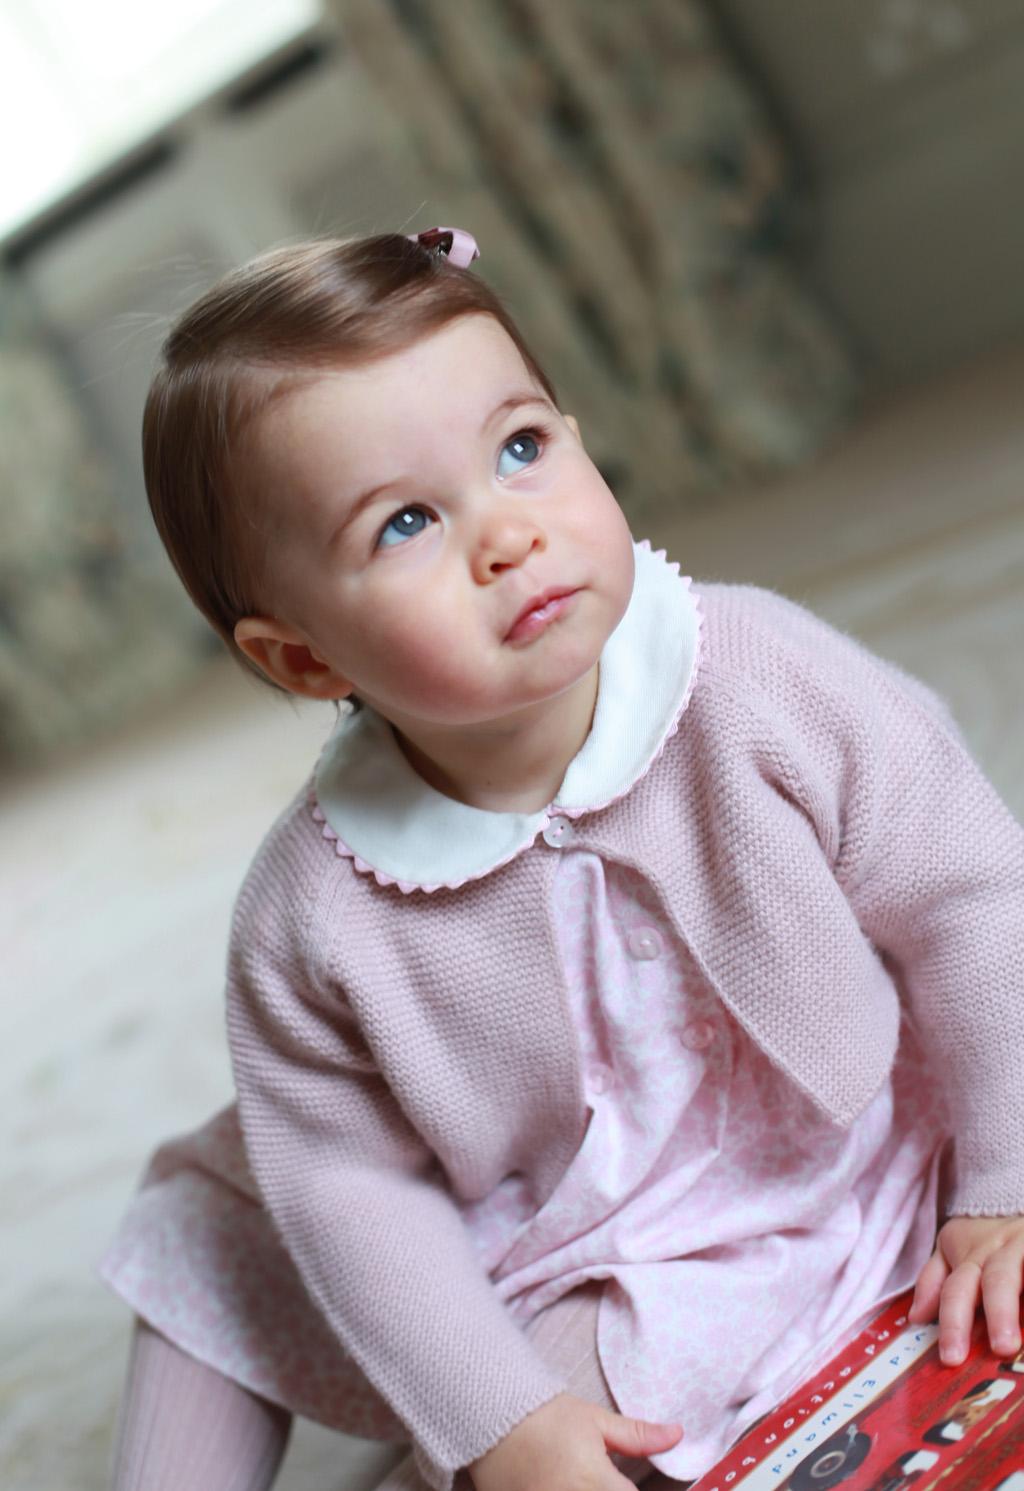 Princess Charlotte turns one tomorrow. (Kensington Palace)